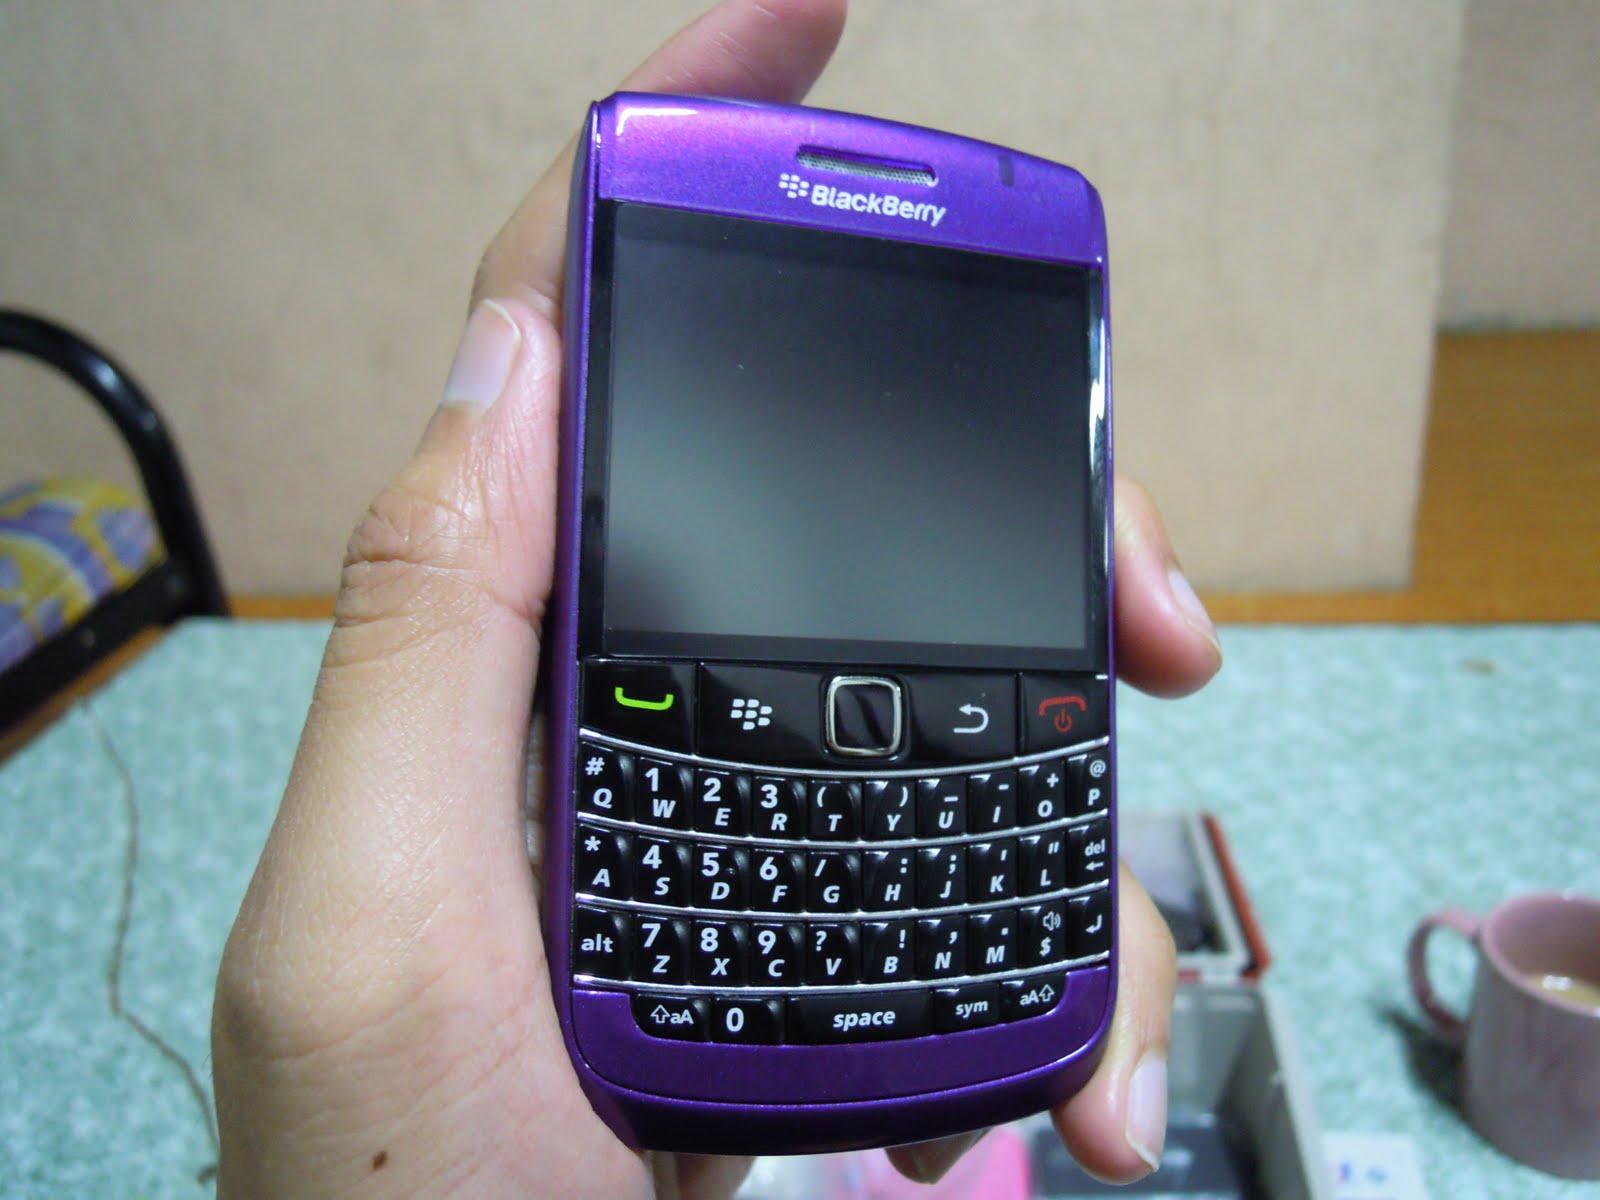 yujito accessories blackberry bold 9700 housing purple. Black Bedroom Furniture Sets. Home Design Ideas